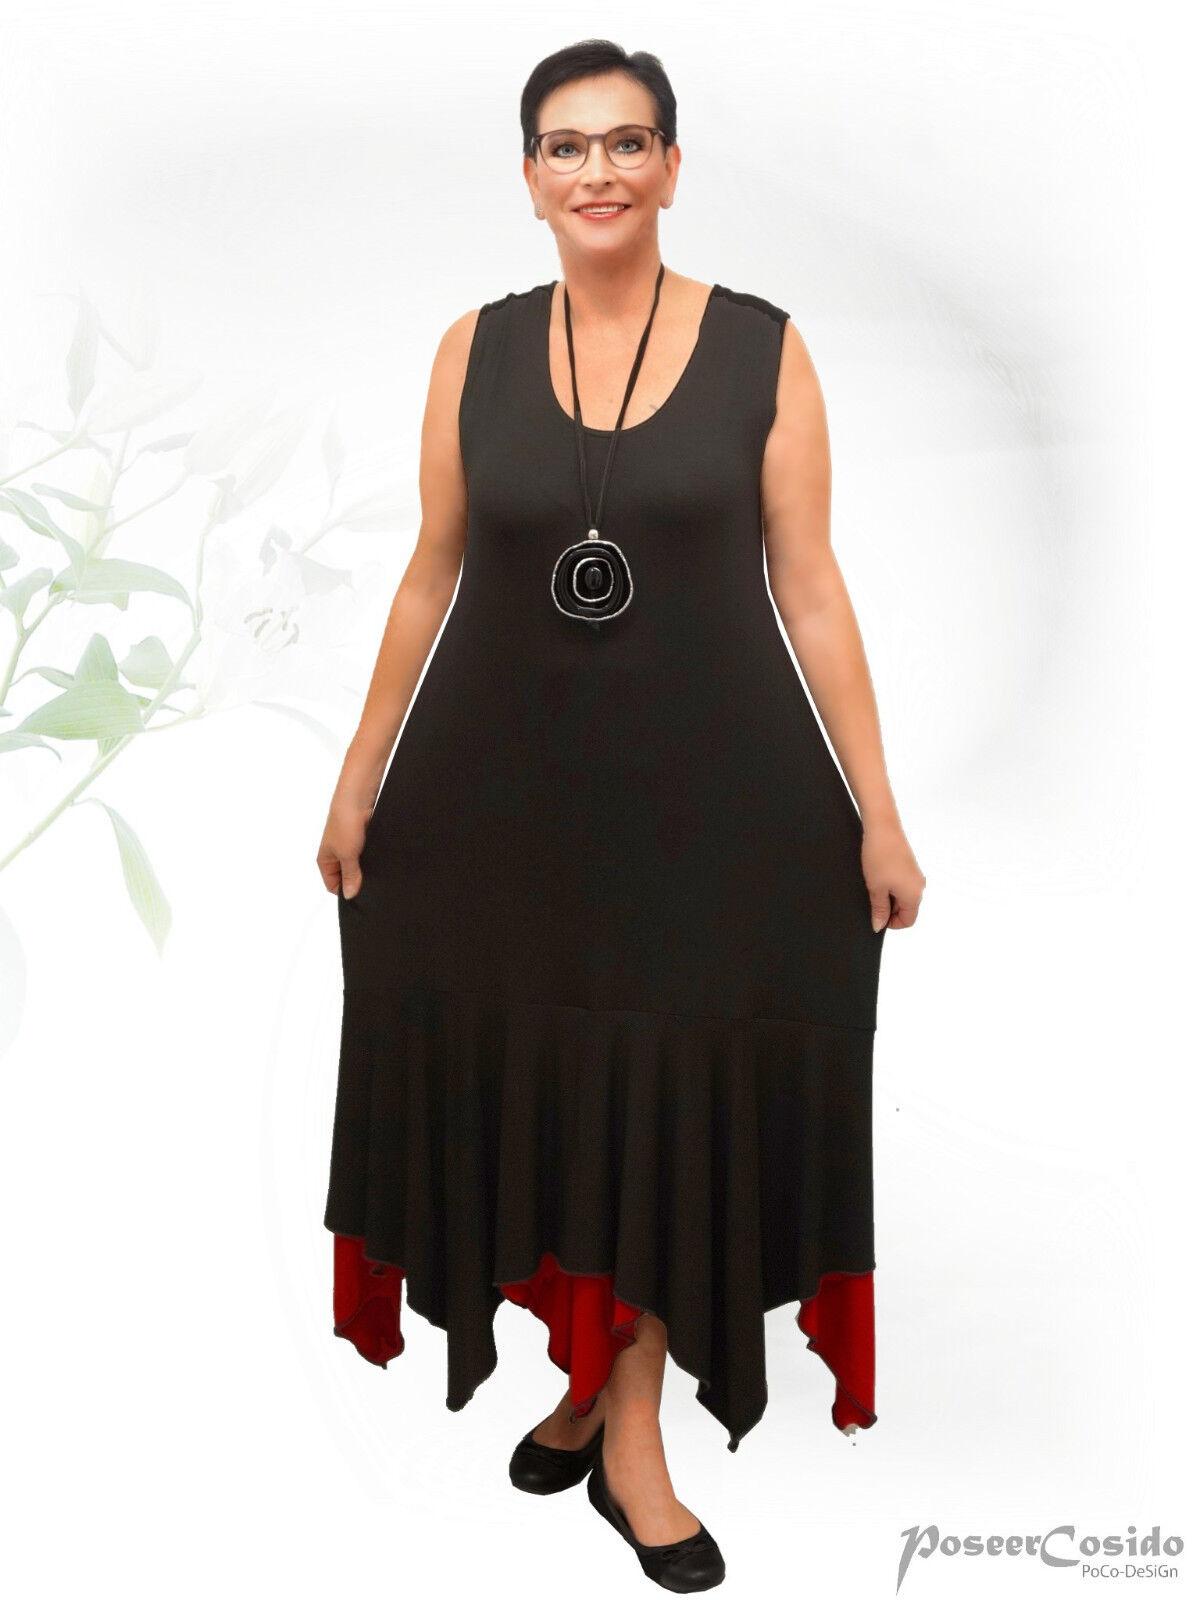 Superposition Ballon - Robe Godet Noir Rouge 44 46 48 50 52 54 56 58 L XL XXL